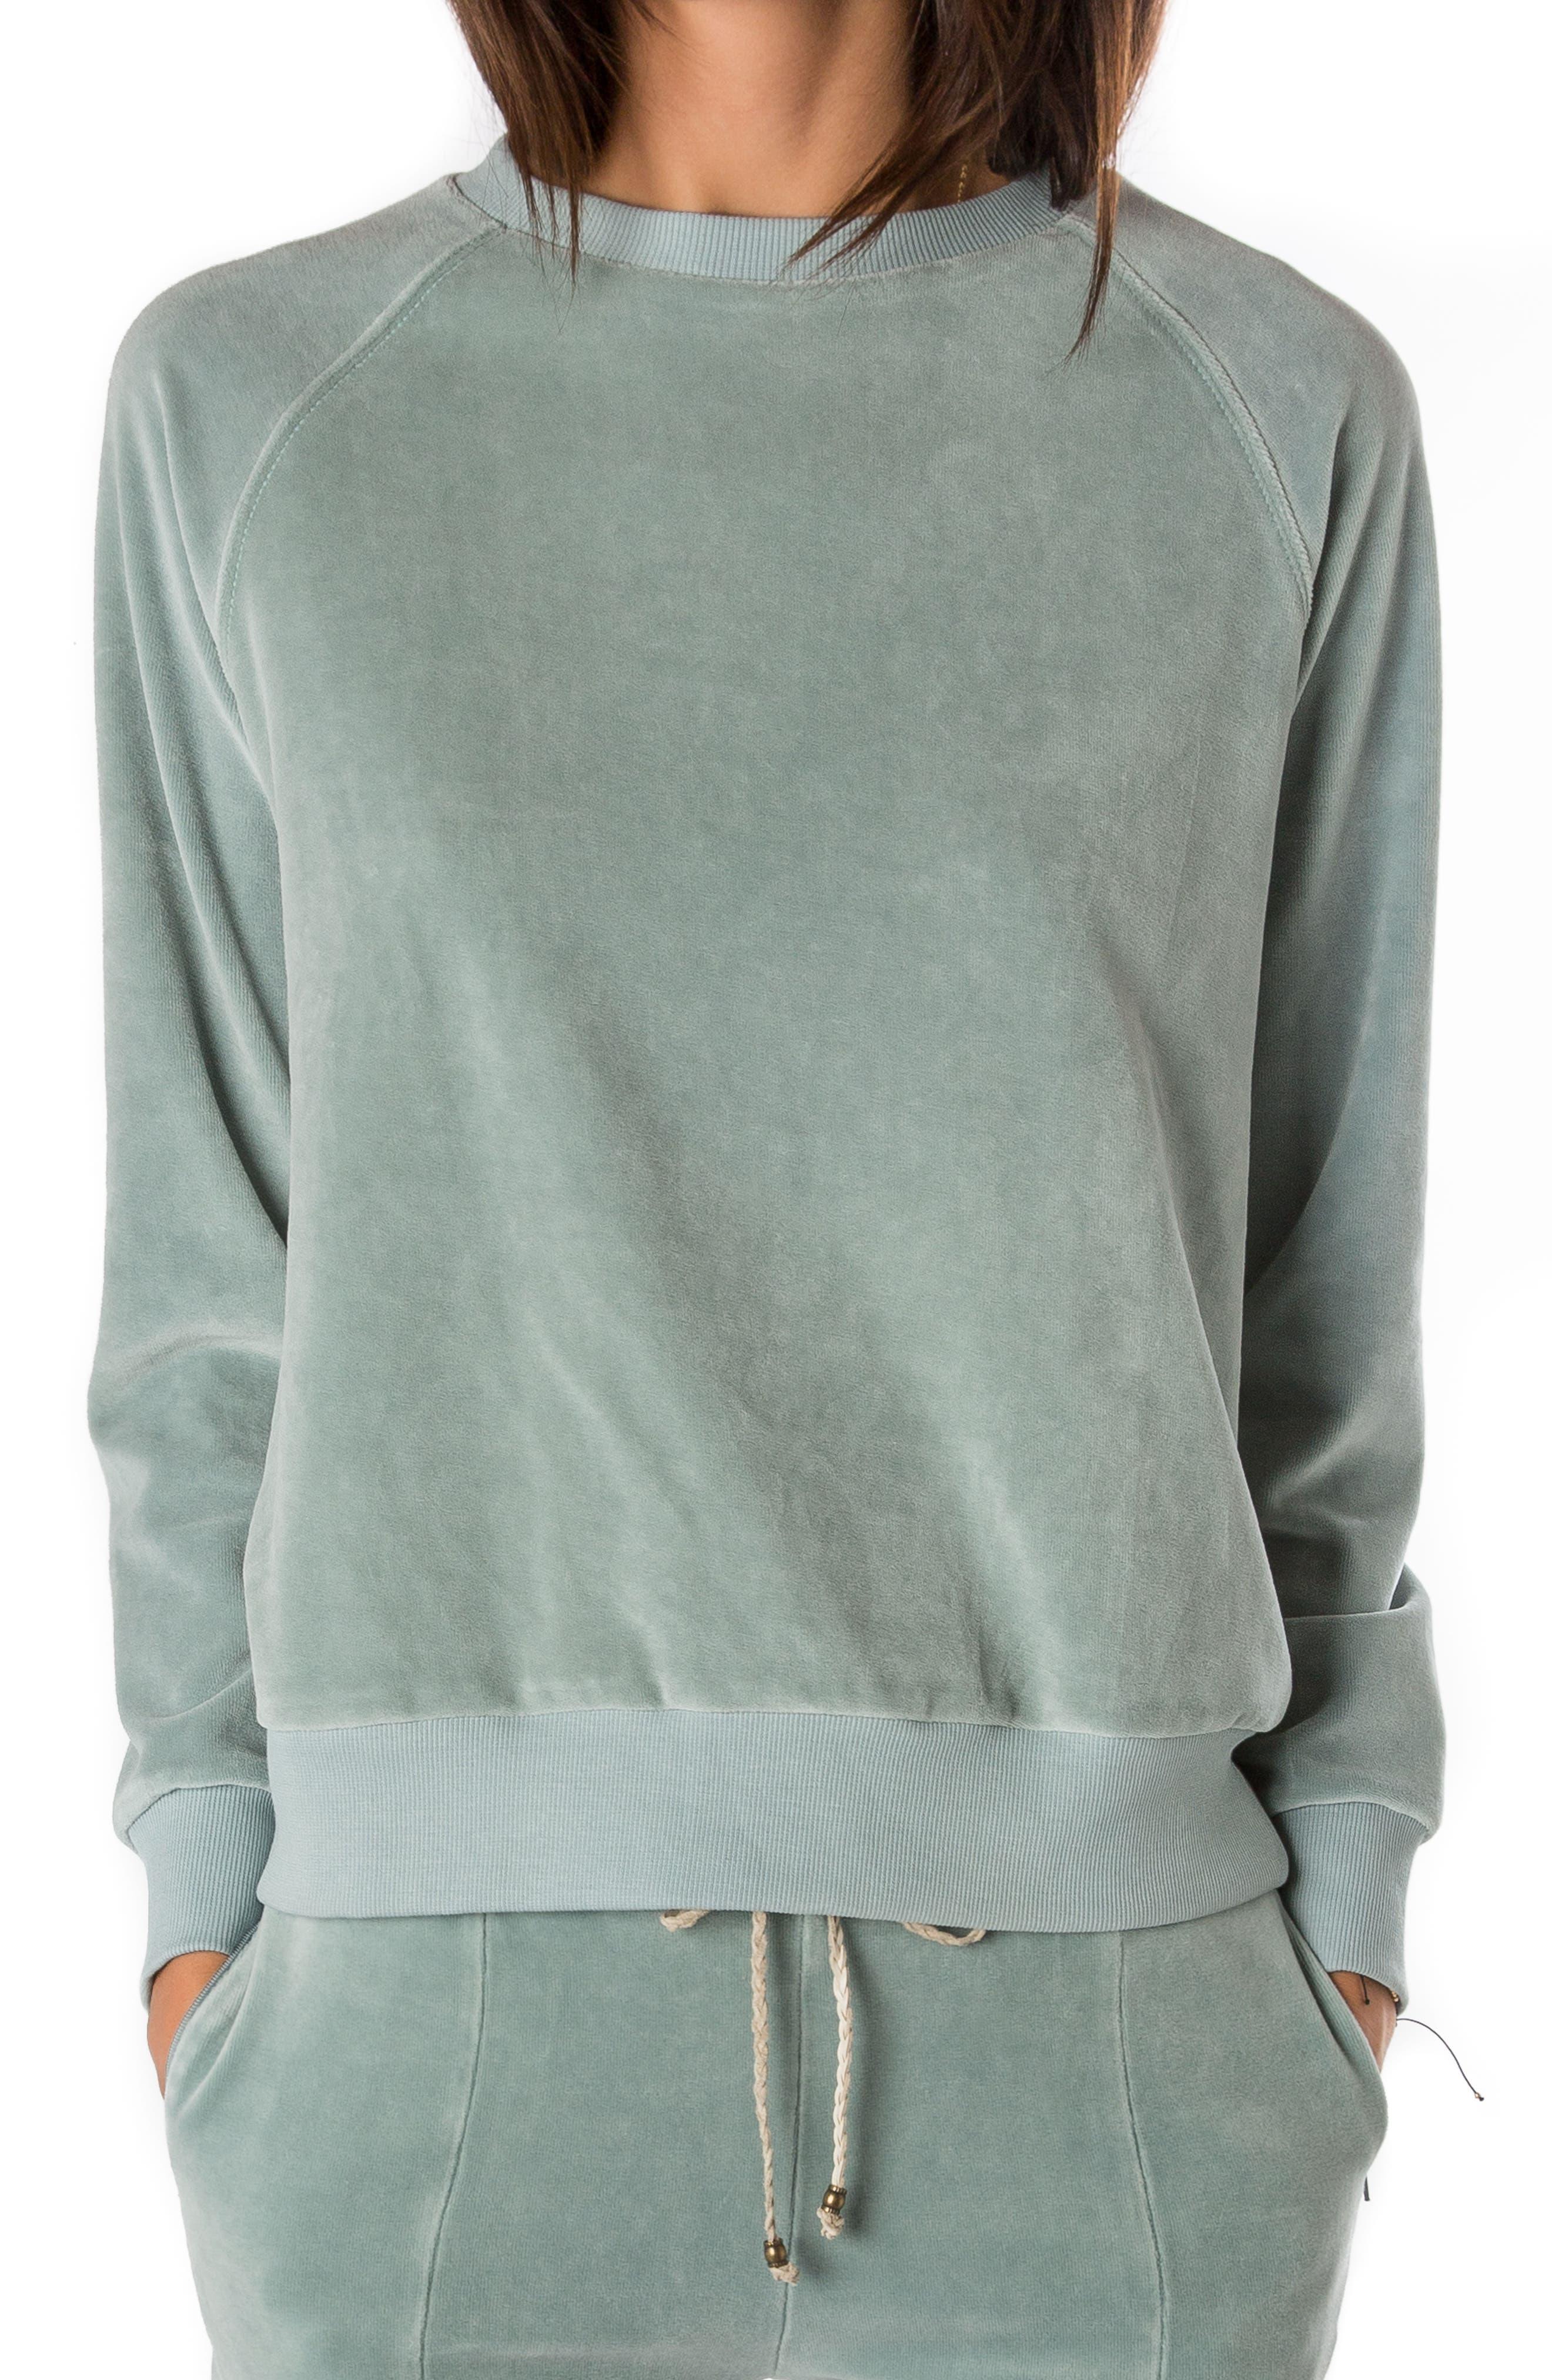 Main Image - Ragdoll Velour Sweatshirt